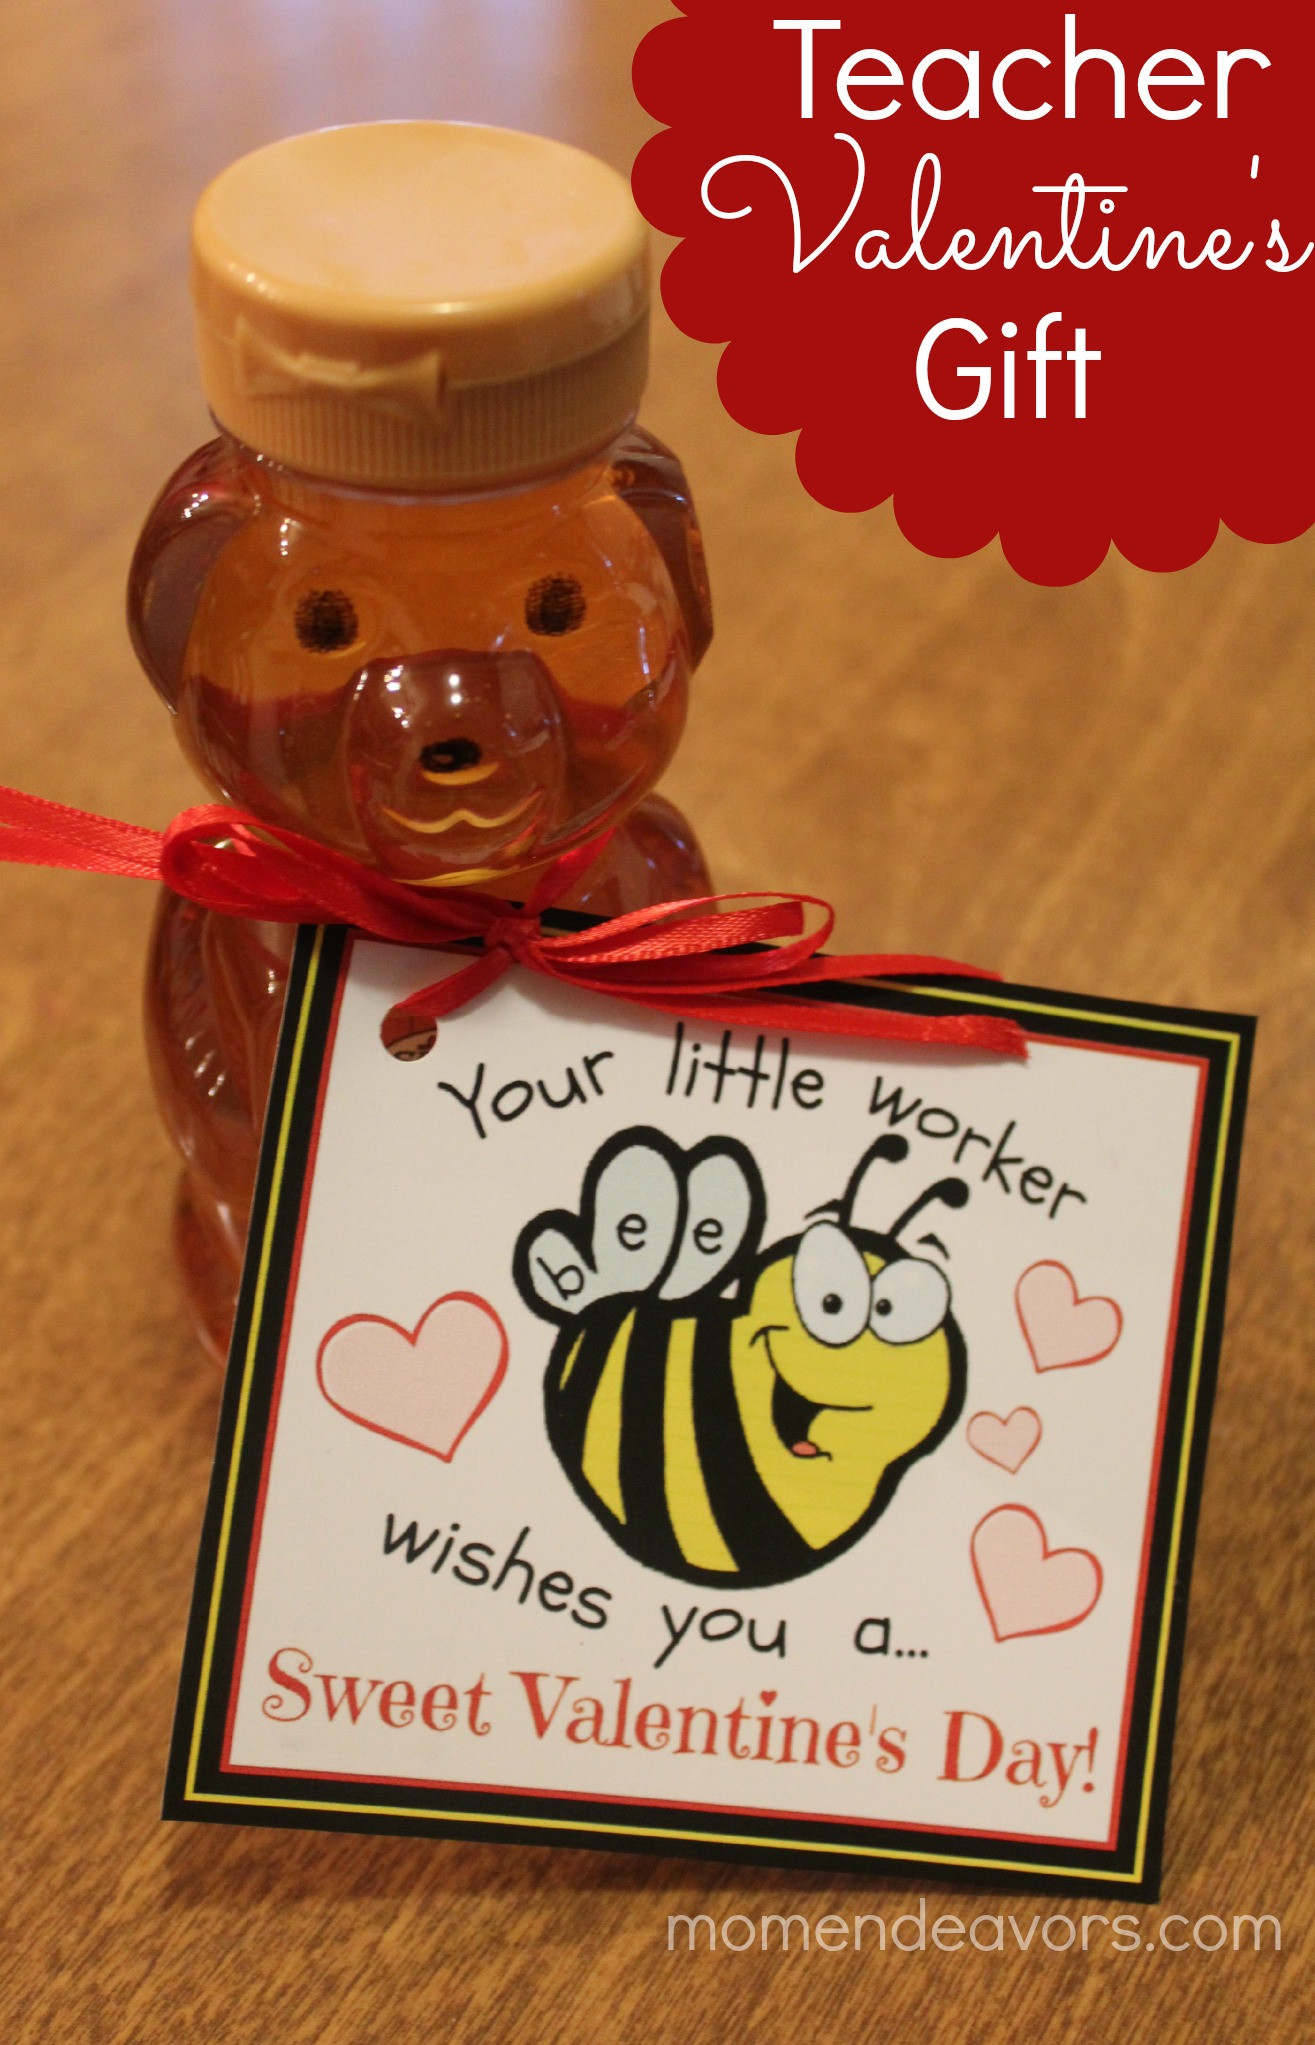 Valentines Gift Ideas For Teachers  Bee themed Teacher Valentine's Gift